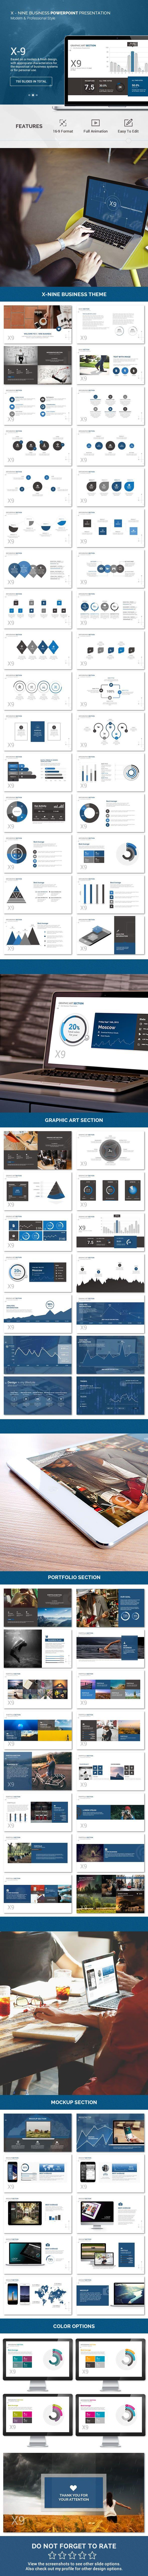 X nine Business PowerPoint Template #slides #design Download: http://graphicriver.net/item/x-nine-business-/13303752?ref=ksioks